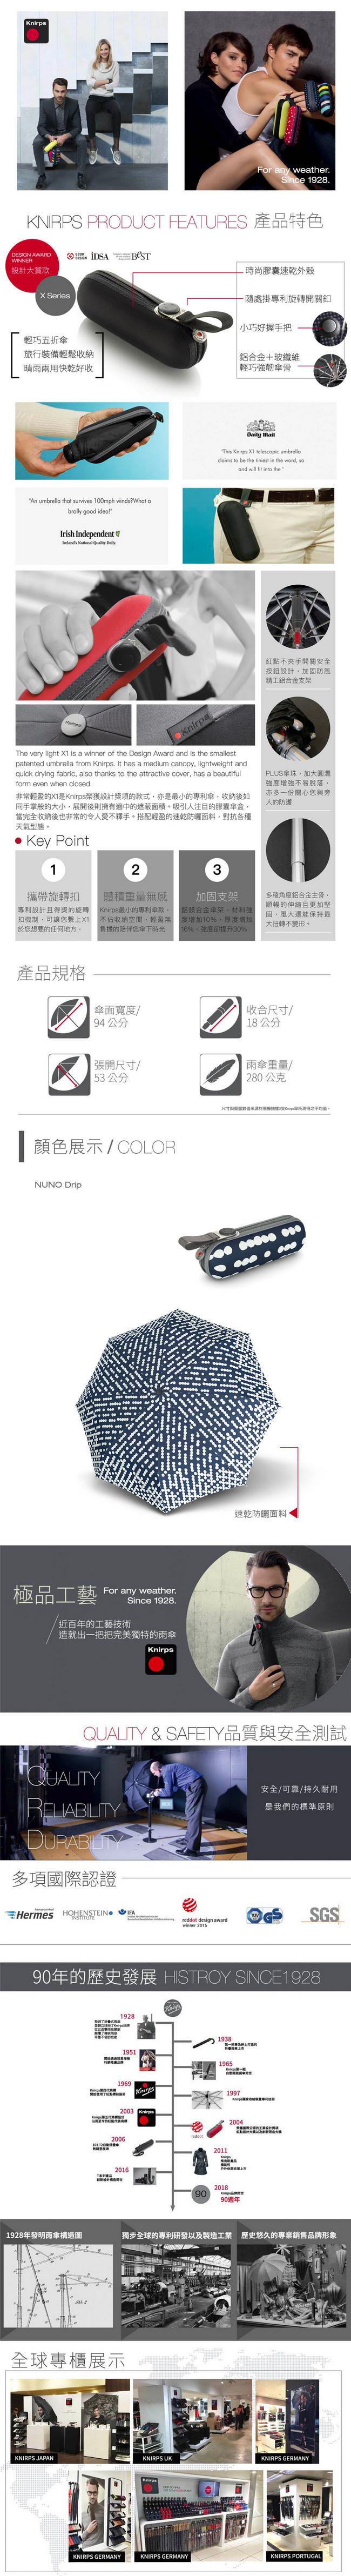 Knirps德國紅點傘 X1 膠囊五折傘-NUNO Drip